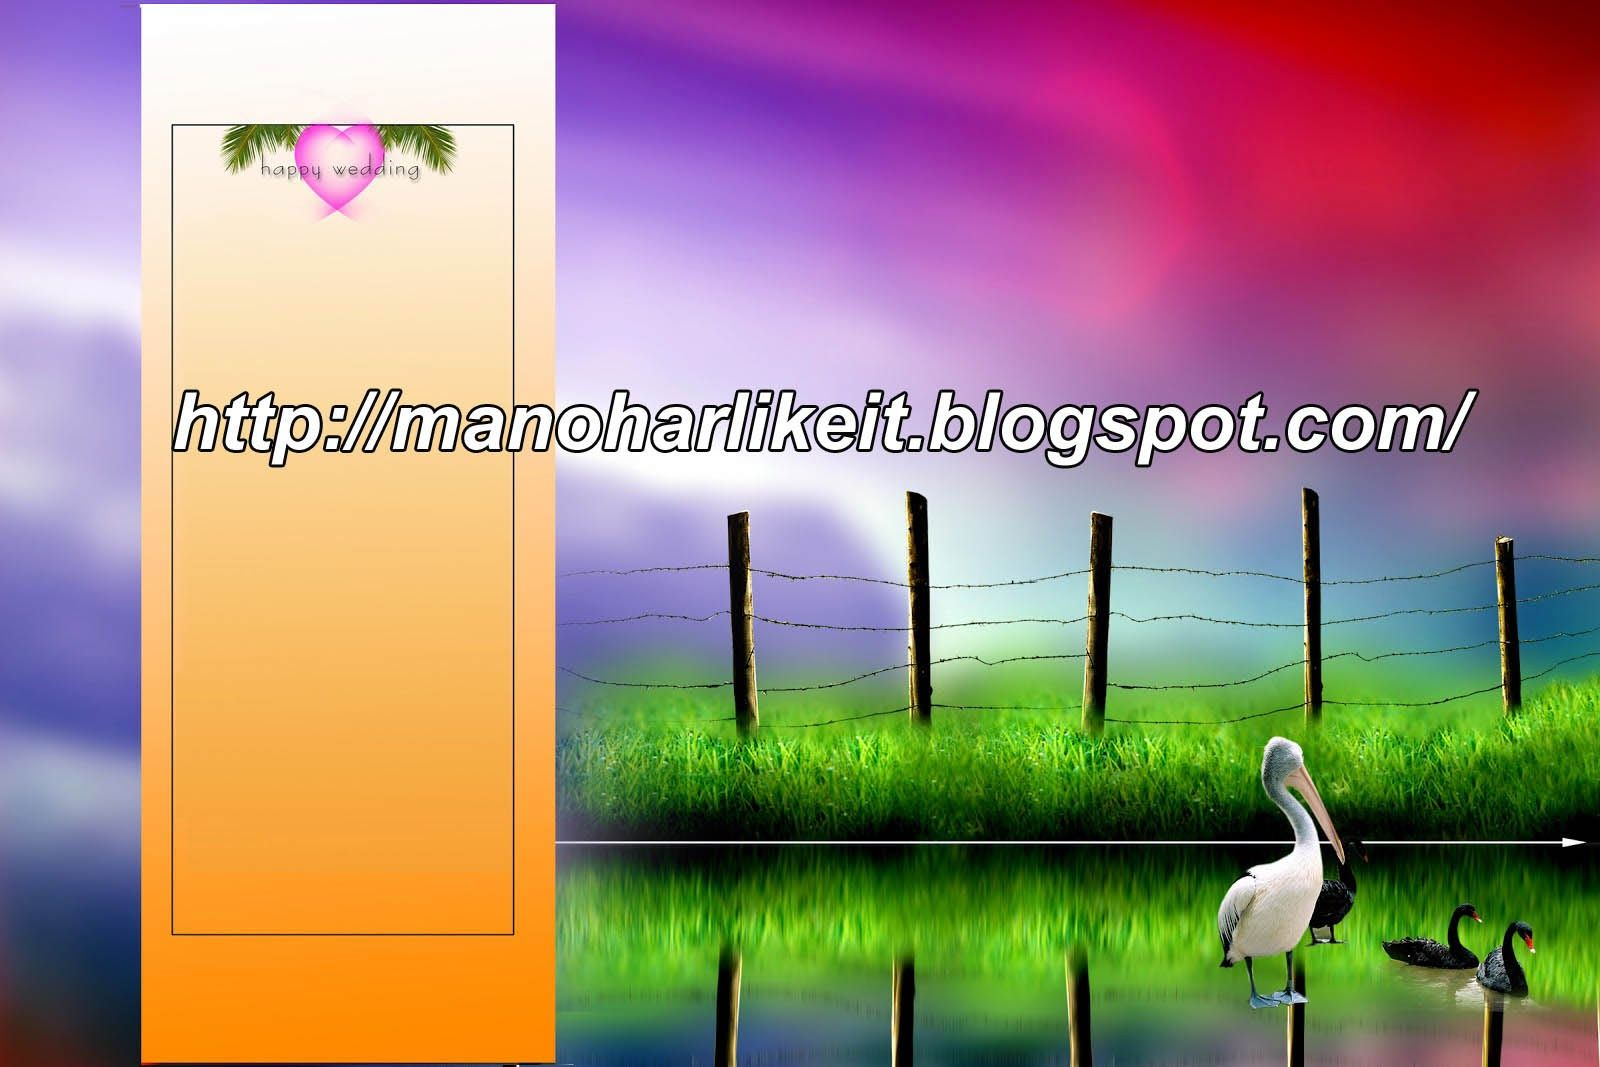 Wedding Album Design Psd Files Free Download Wedding Album Design Album Design Marriage Photo Album